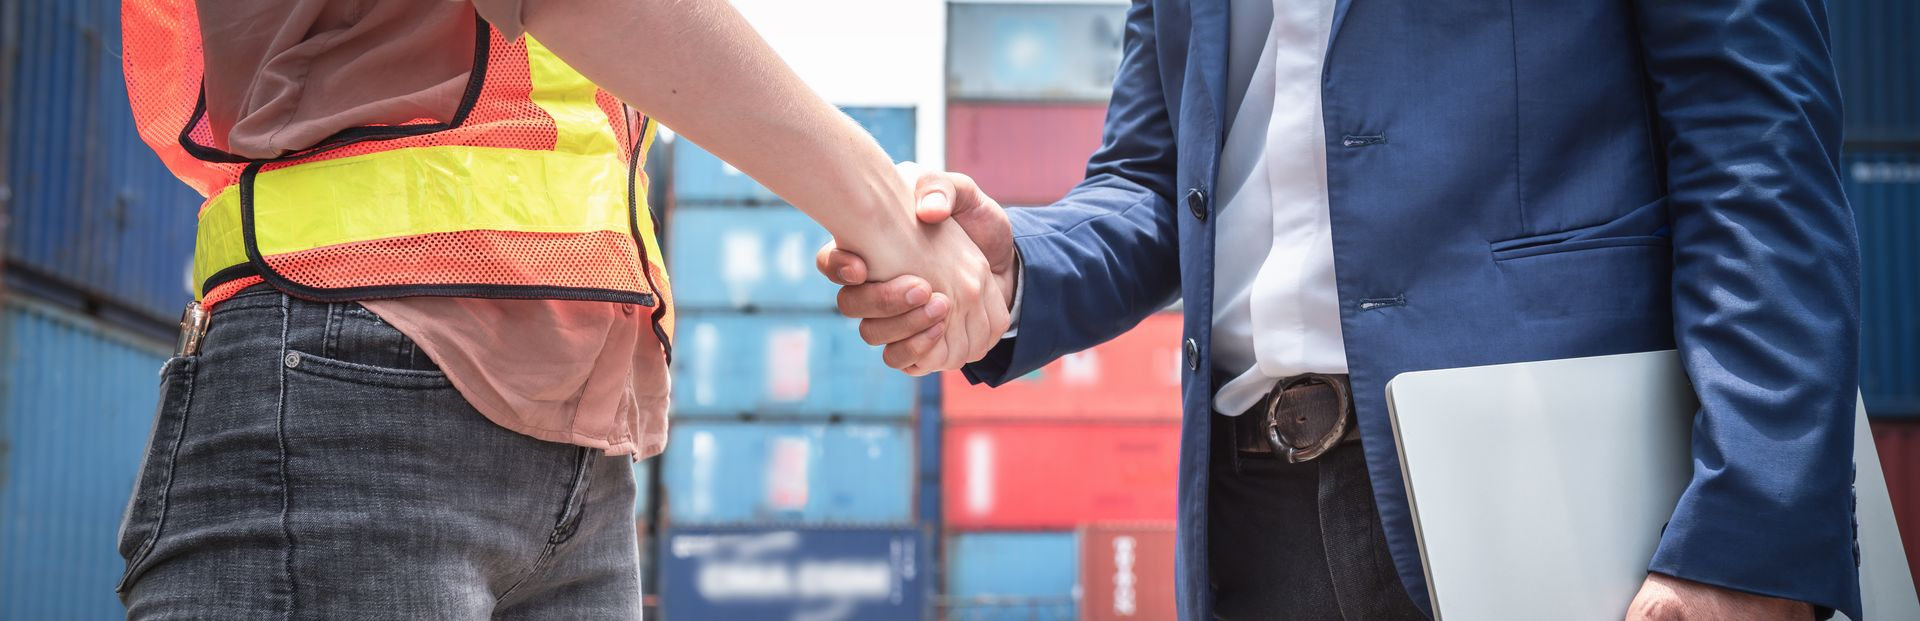 Advantages of third party logistics